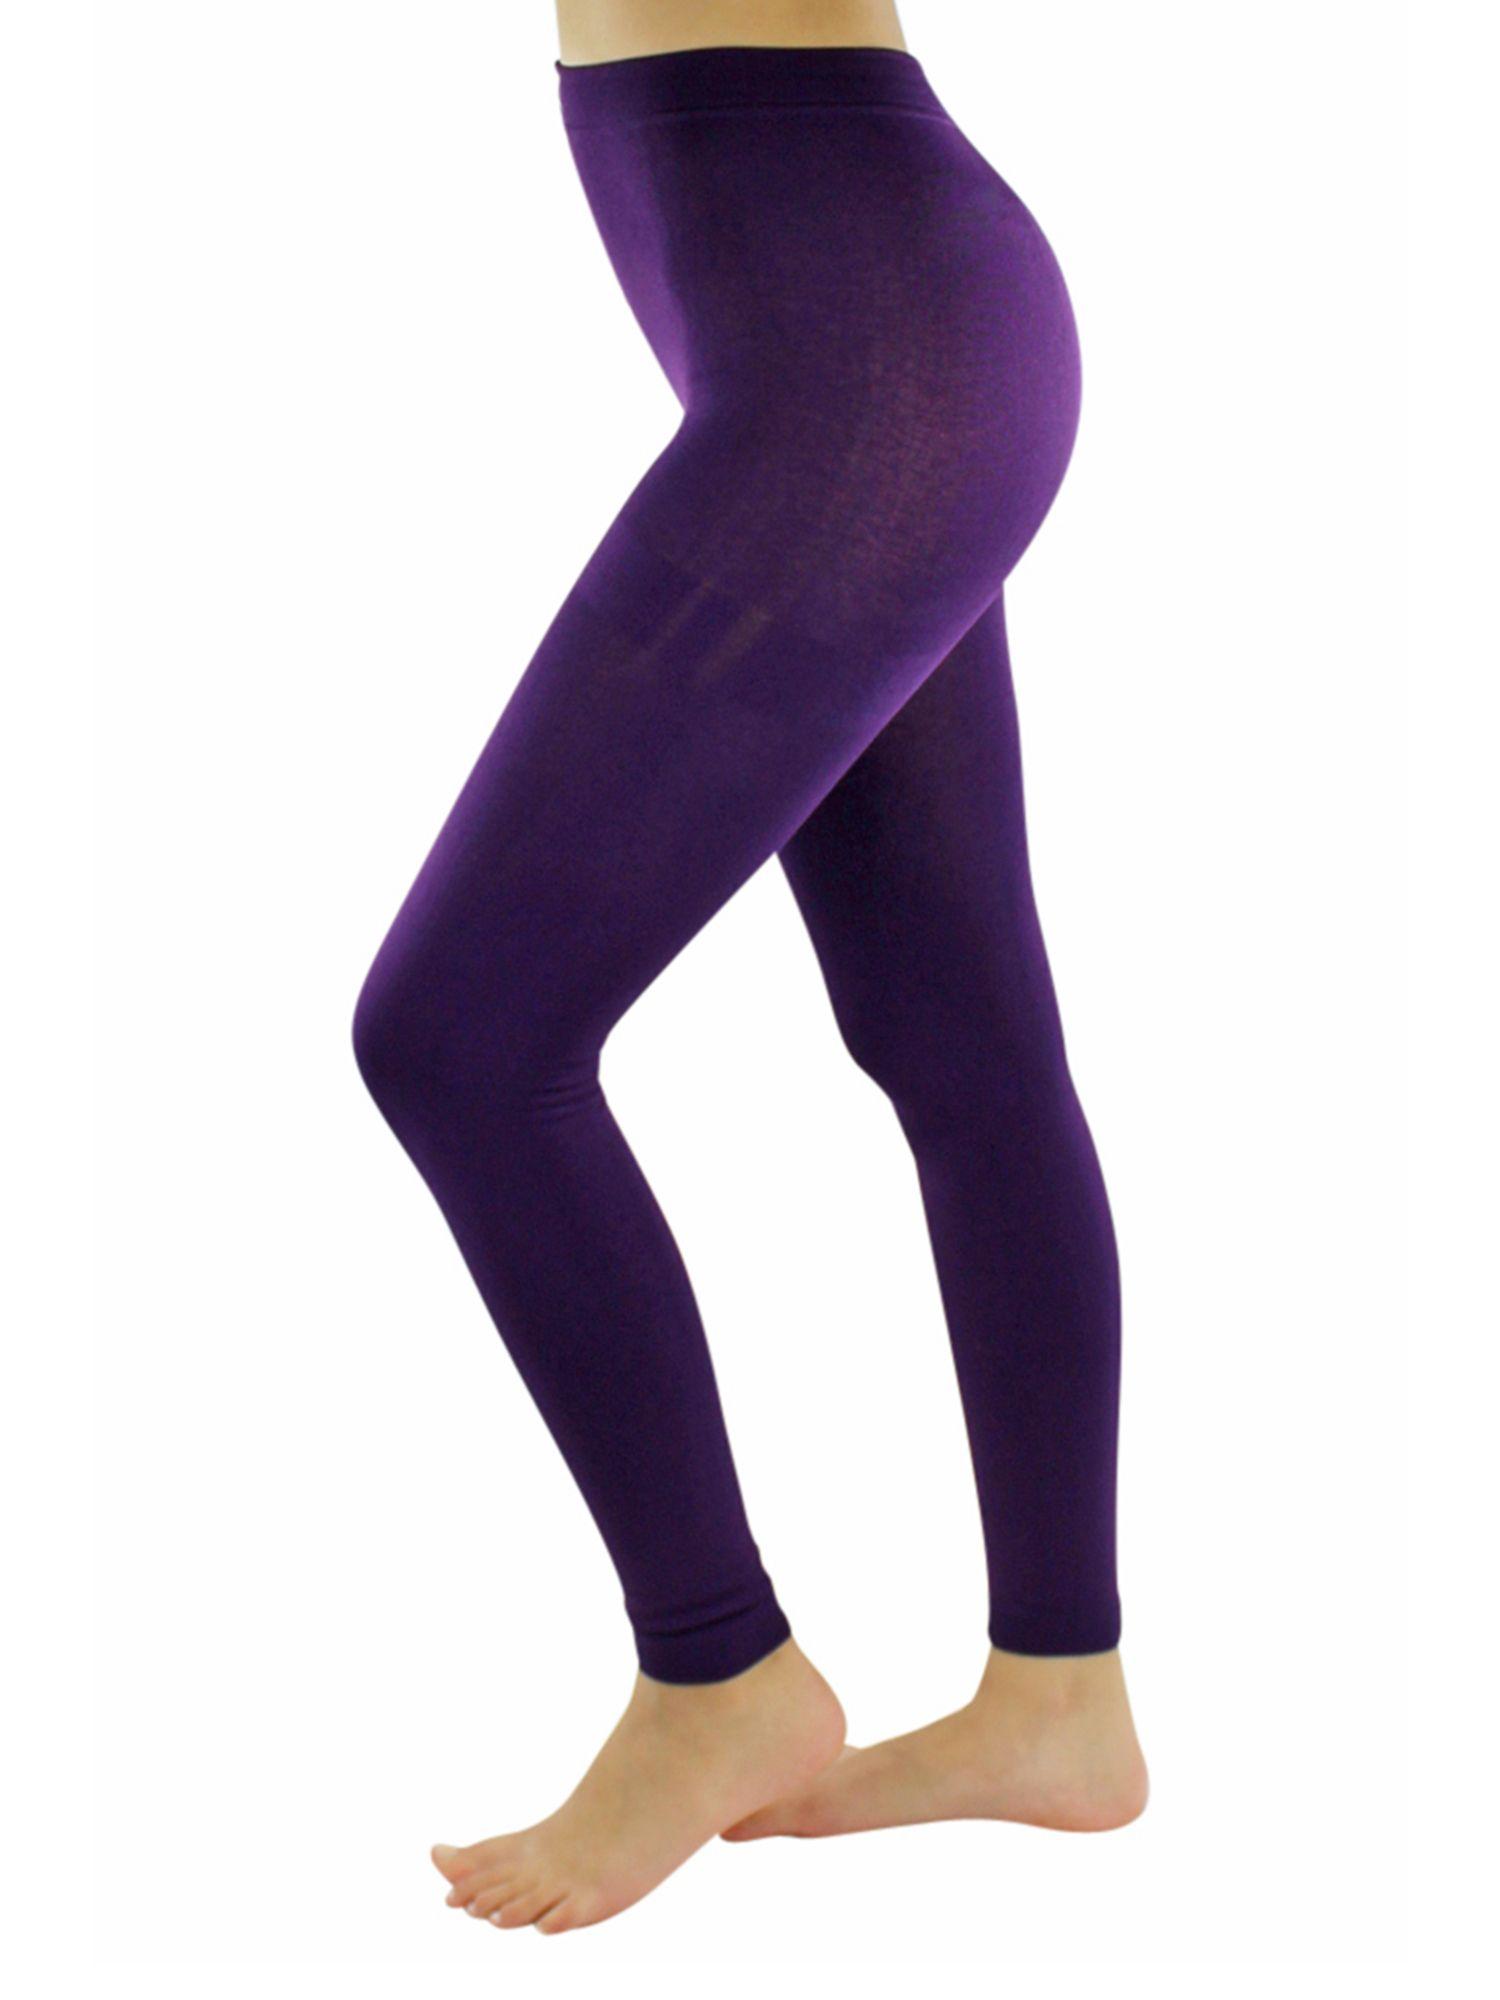 Thick Opaque Fleece Lined Leggings Ad Opaque Ad Thick Fleece Cute Leggings Colorful Leggings Fleece